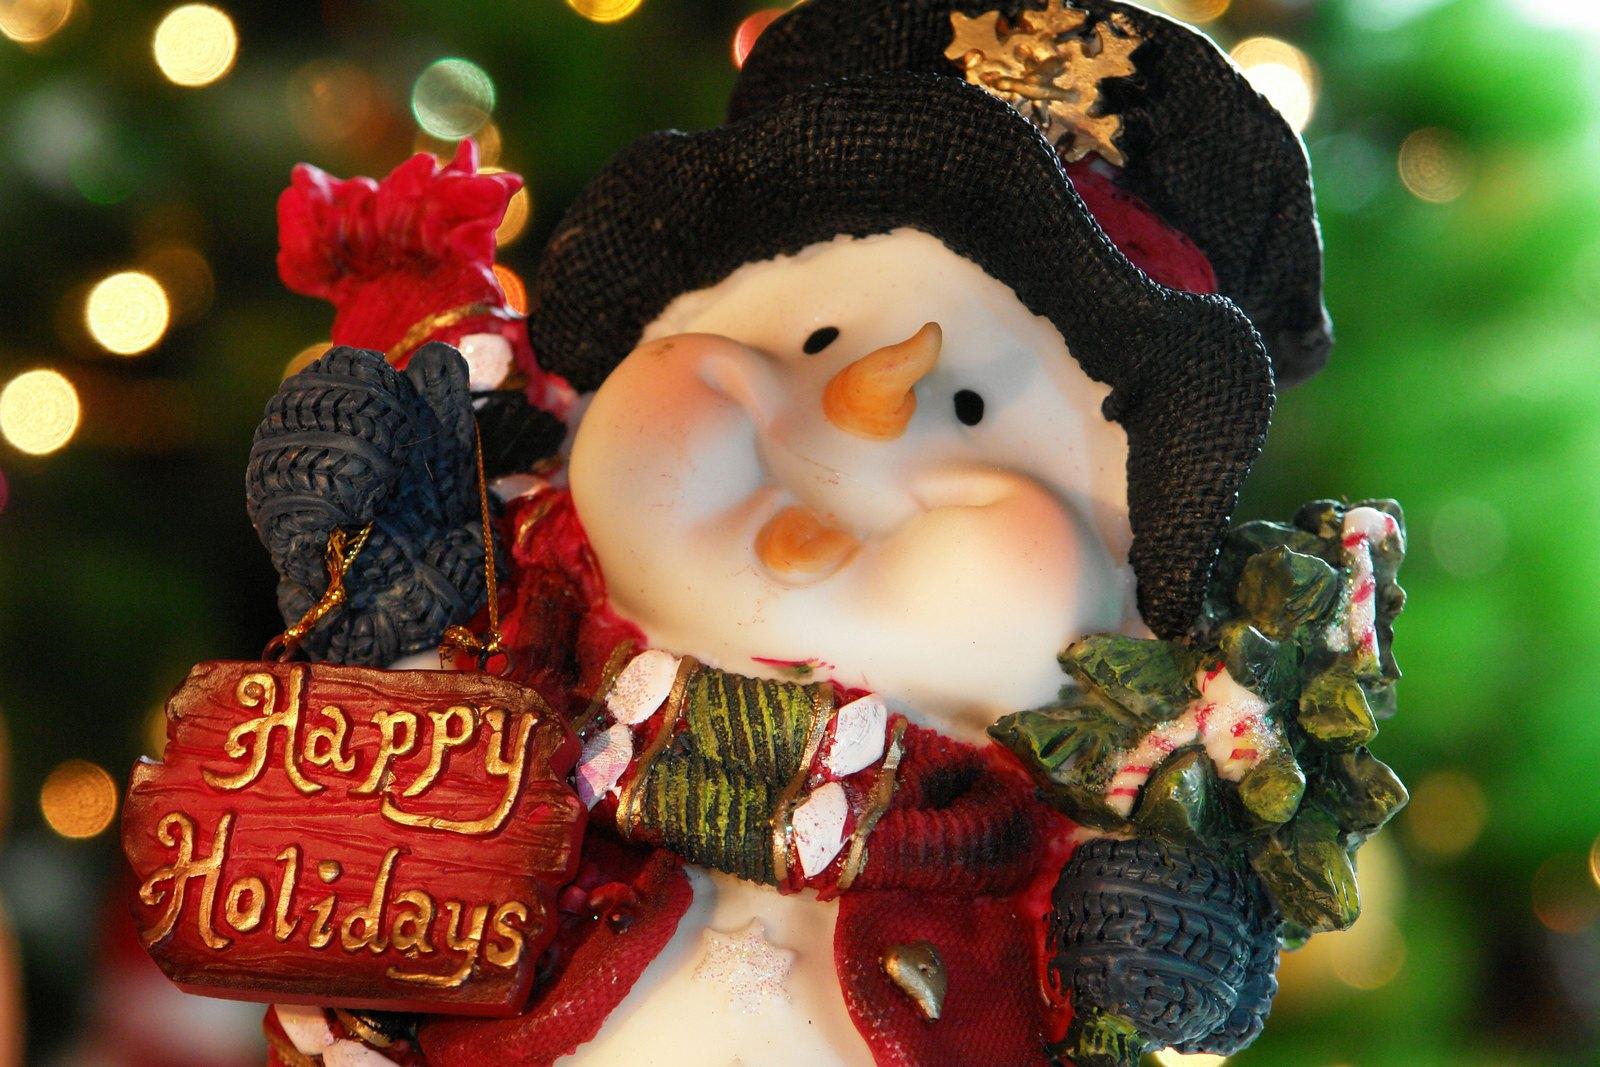 http://1.bp.blogspot.com/-YbWwtIIez48/UKINETo_3uI/AAAAAAAAAko/0DQngGCtihg/s1600/wallpaper+christmas2-assignment-x.blogspot.com-Cute-Christmas-wallpapers.jpg